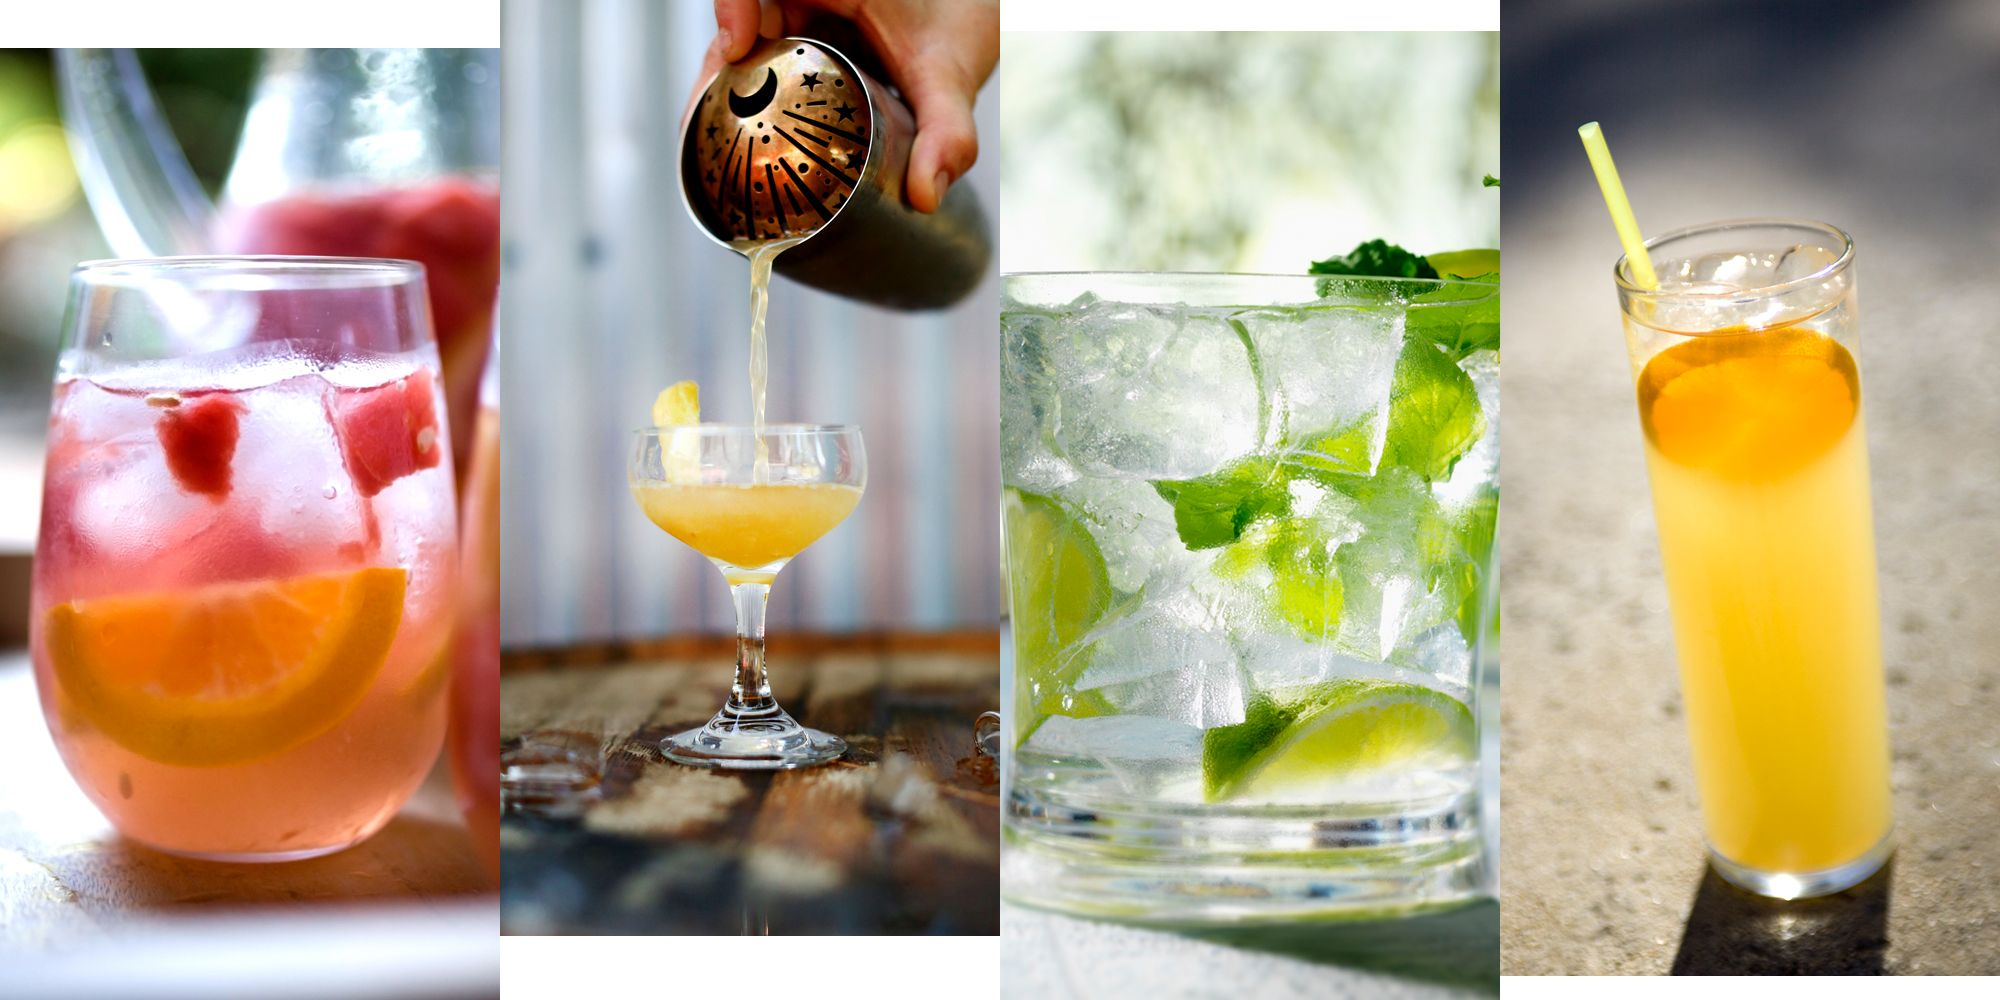 The 8 Best Spring Cocktails